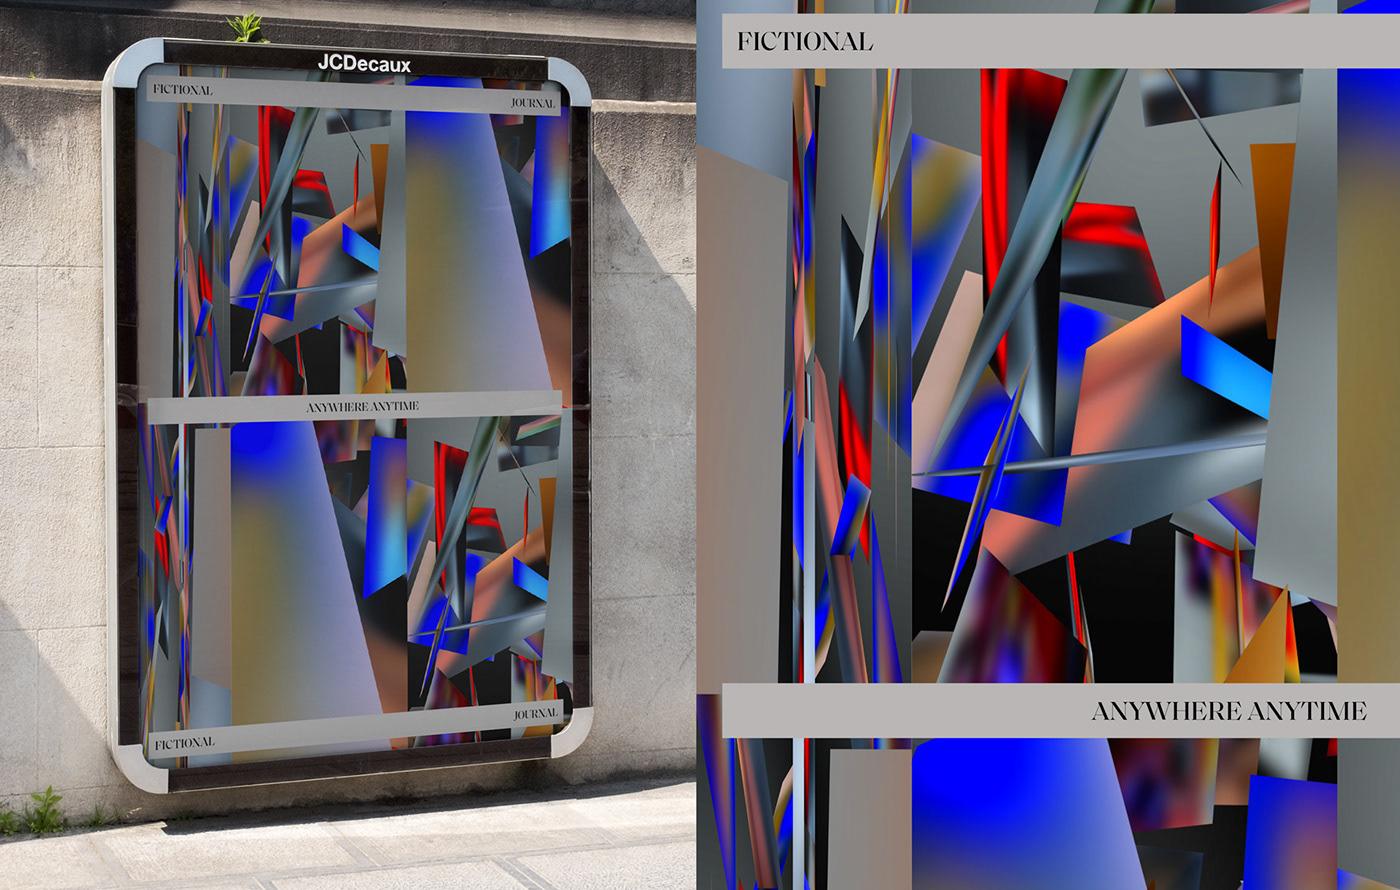 3D motion identity branding  animation  baka baka gabriela fictional journal anywhere